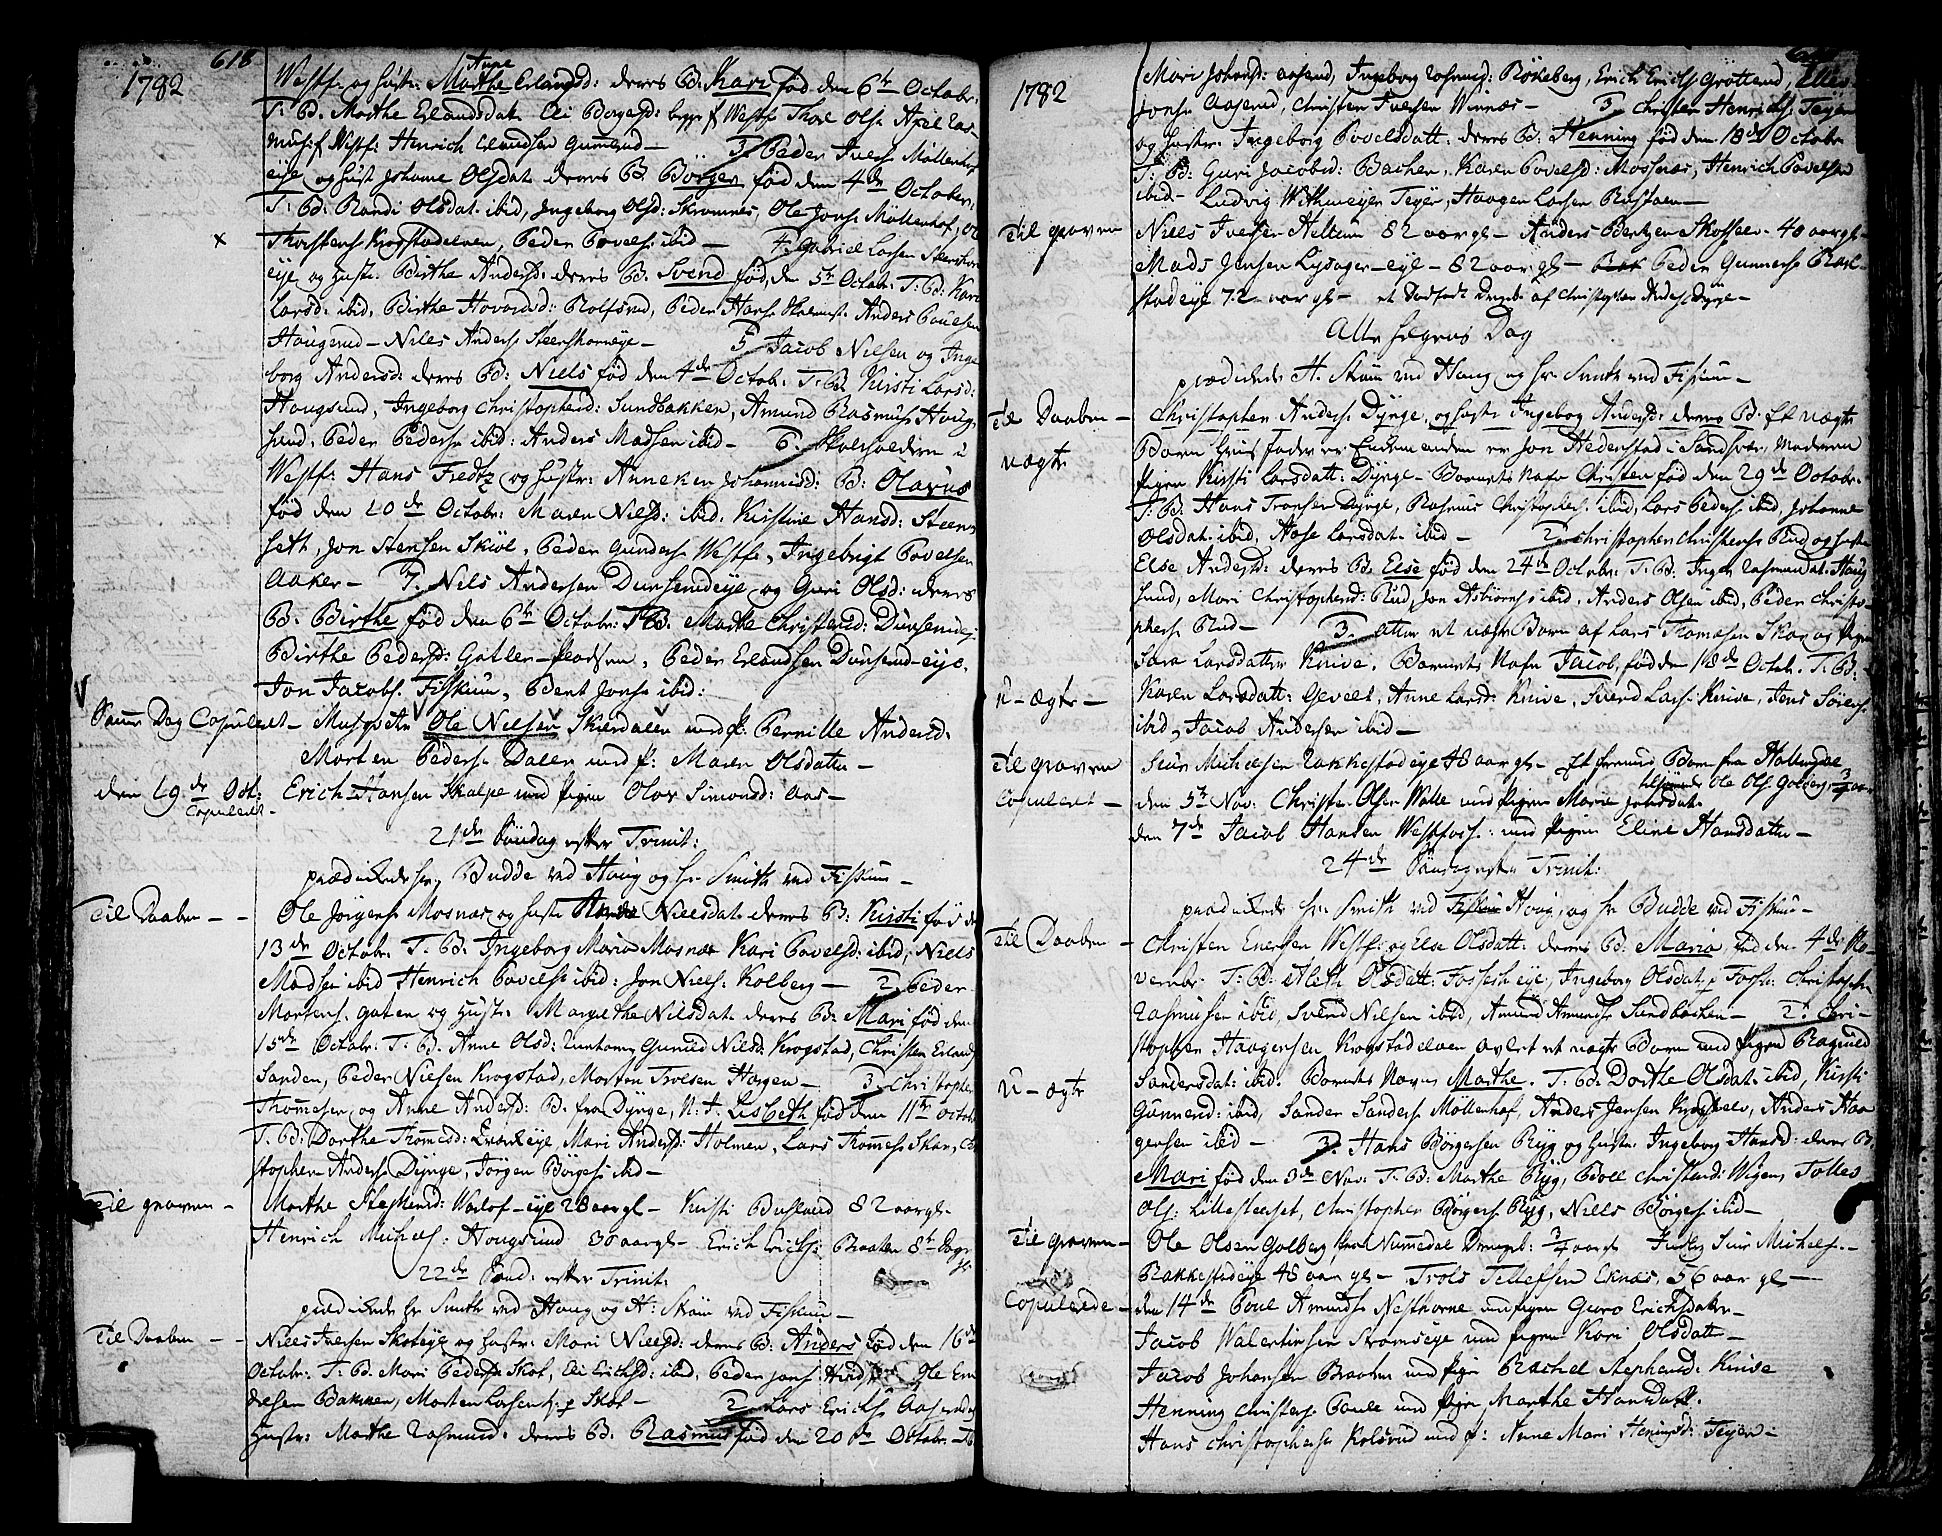 SAKO, Eiker kirkebøker, F/Fa/L0008: Ministerialbok nr. I 8, 1764-1788, s. 618-619